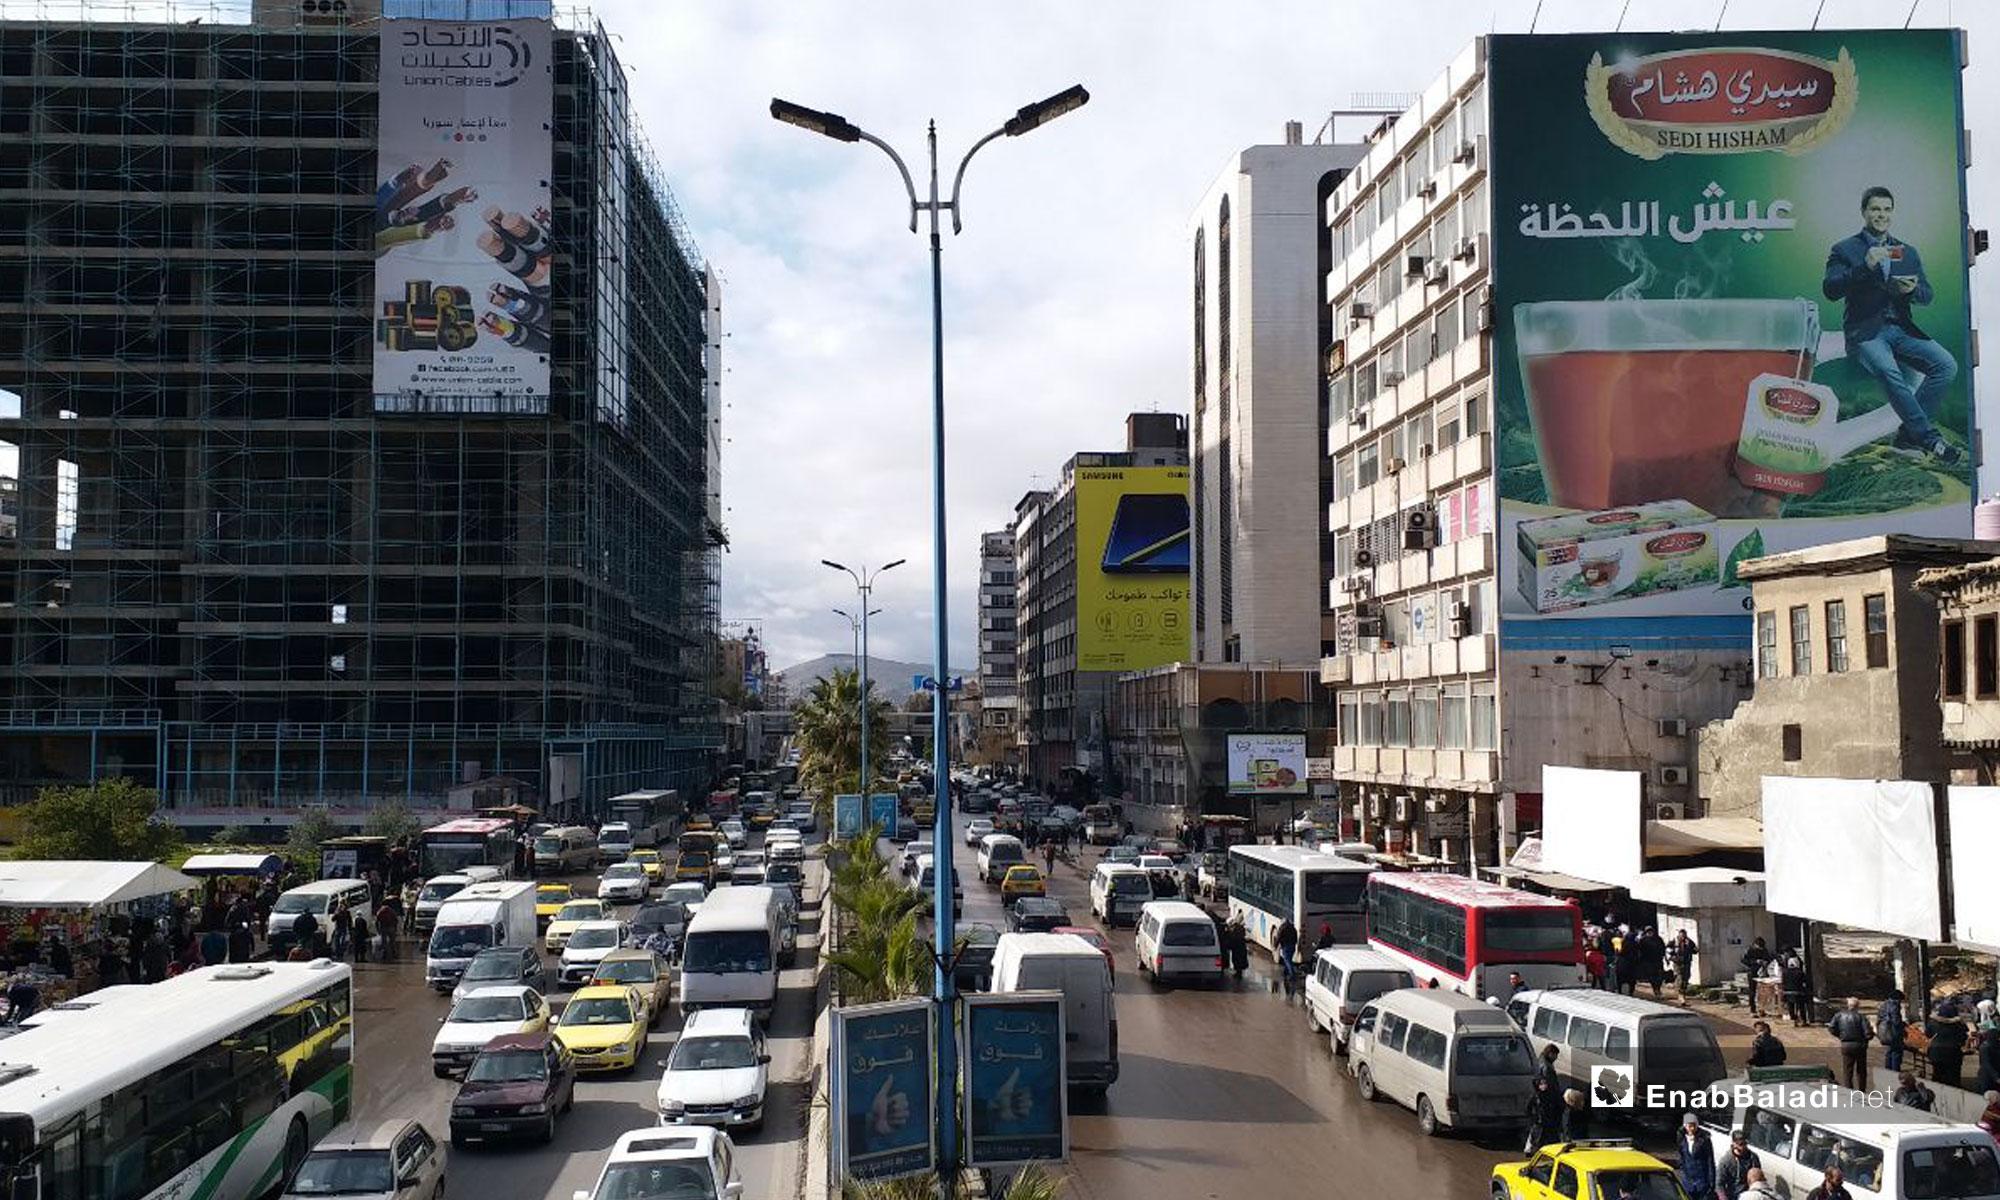 Al-Thawra Street, Damascus - January 12, 2019 (Enab Baladi)